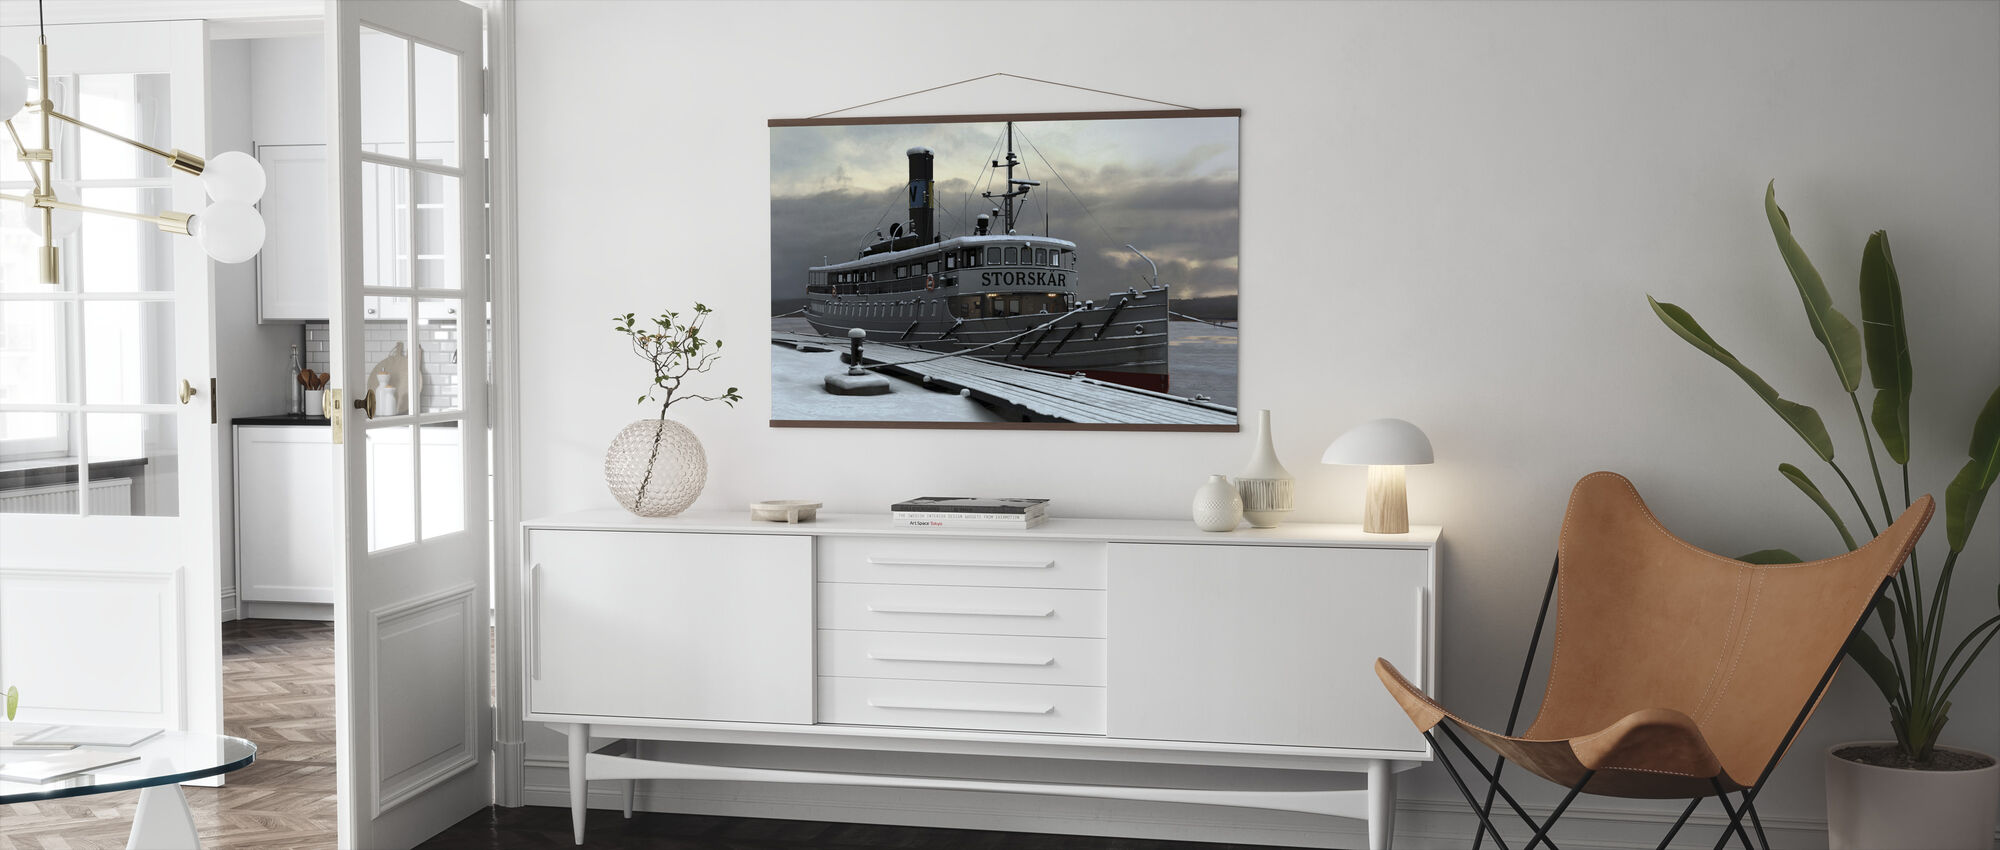 Waxholm Boat - Poster - Living Room